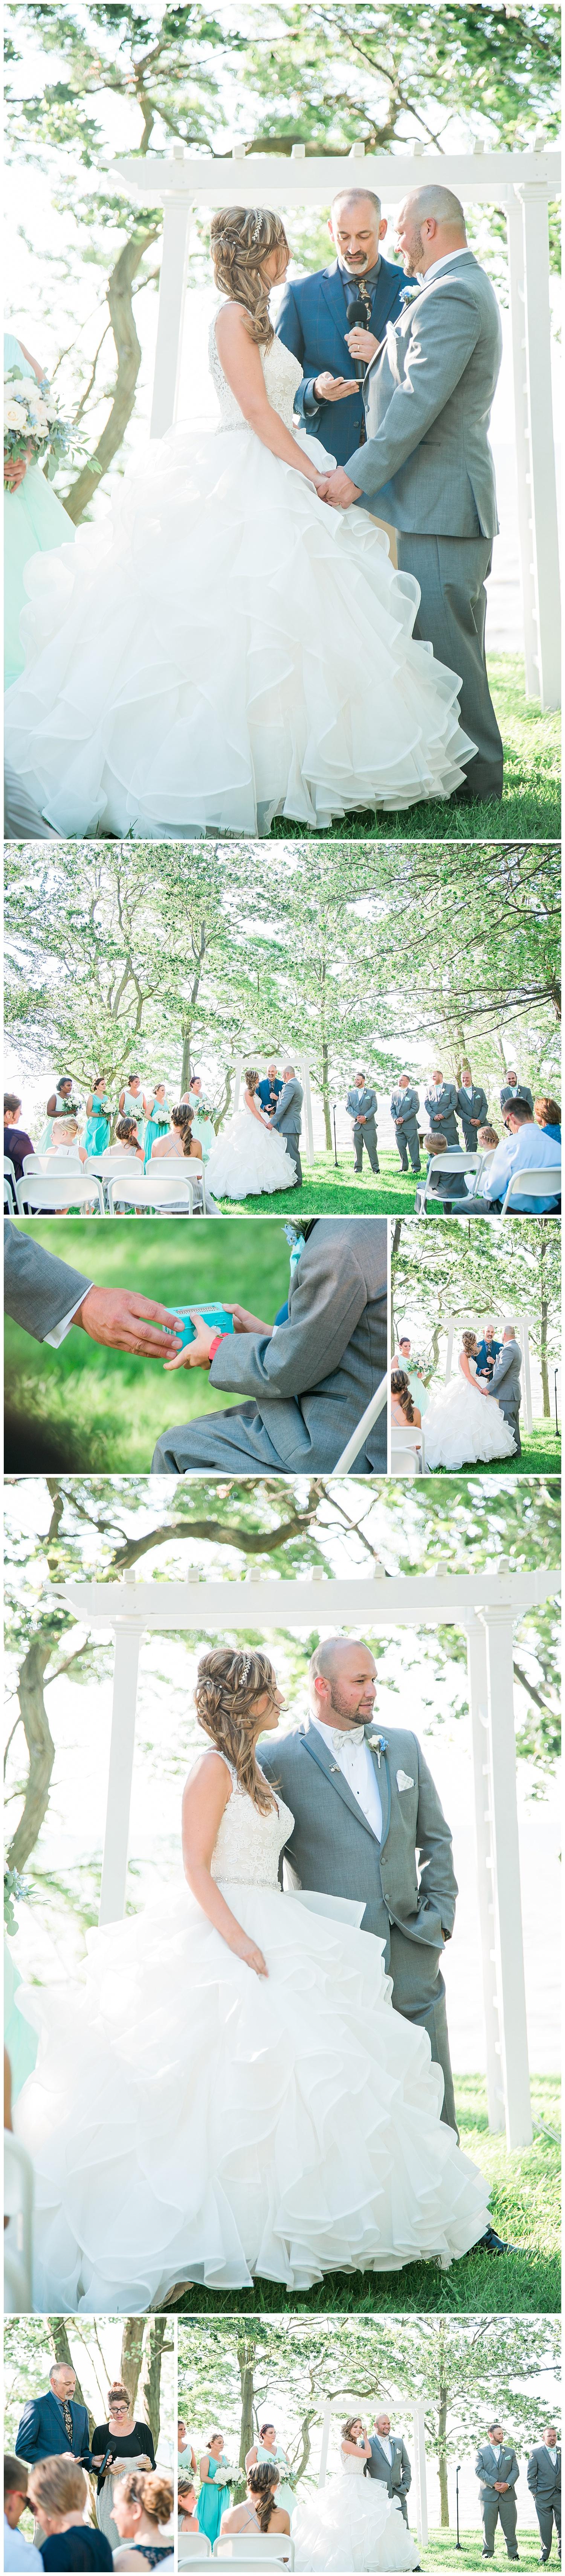 Sean and Andrea - Webster wedding - lass and beau-625_Buffalo wedding photography.jpg